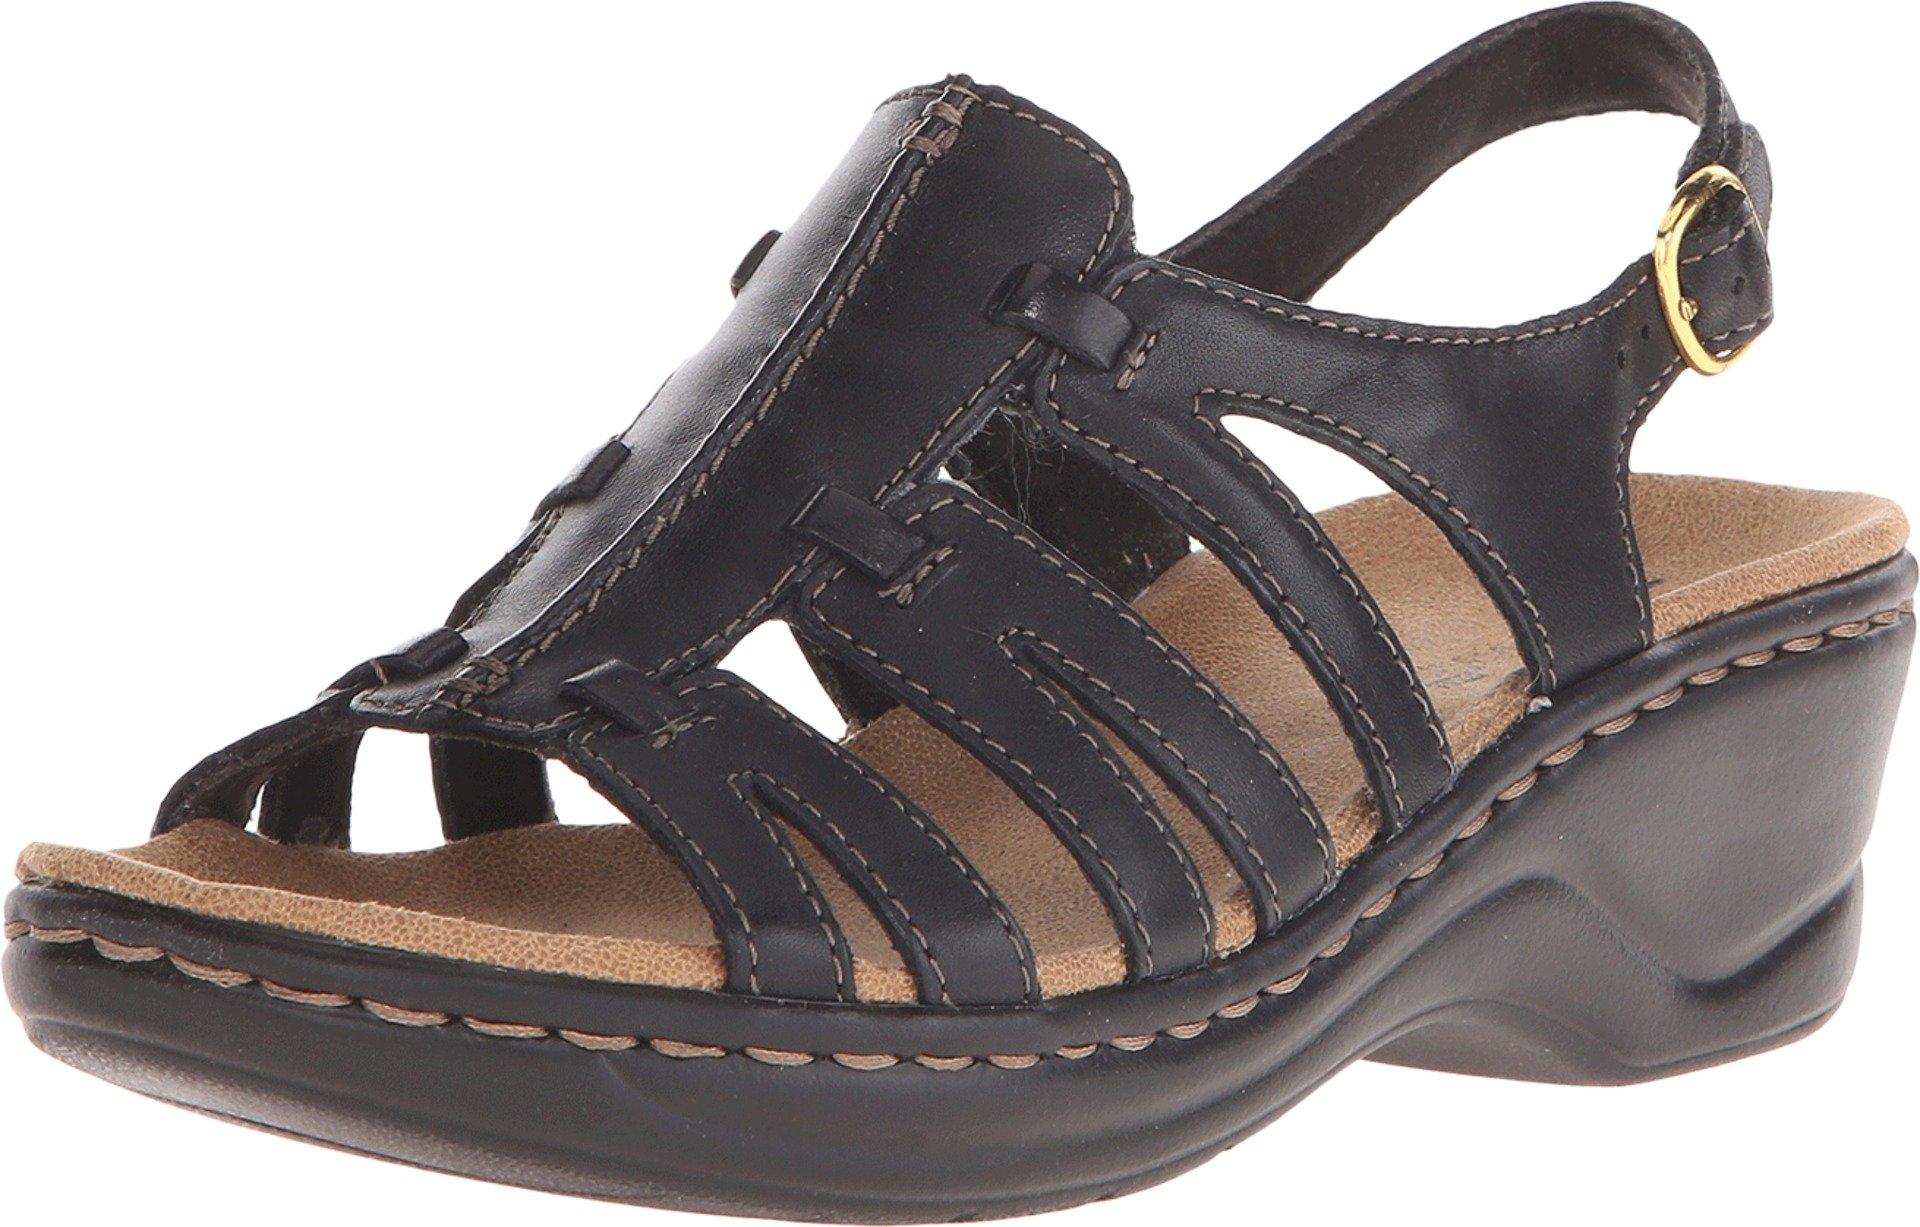 CLARKS Women's Lexi Marigold Q Black Leather 8.5 B - Medium